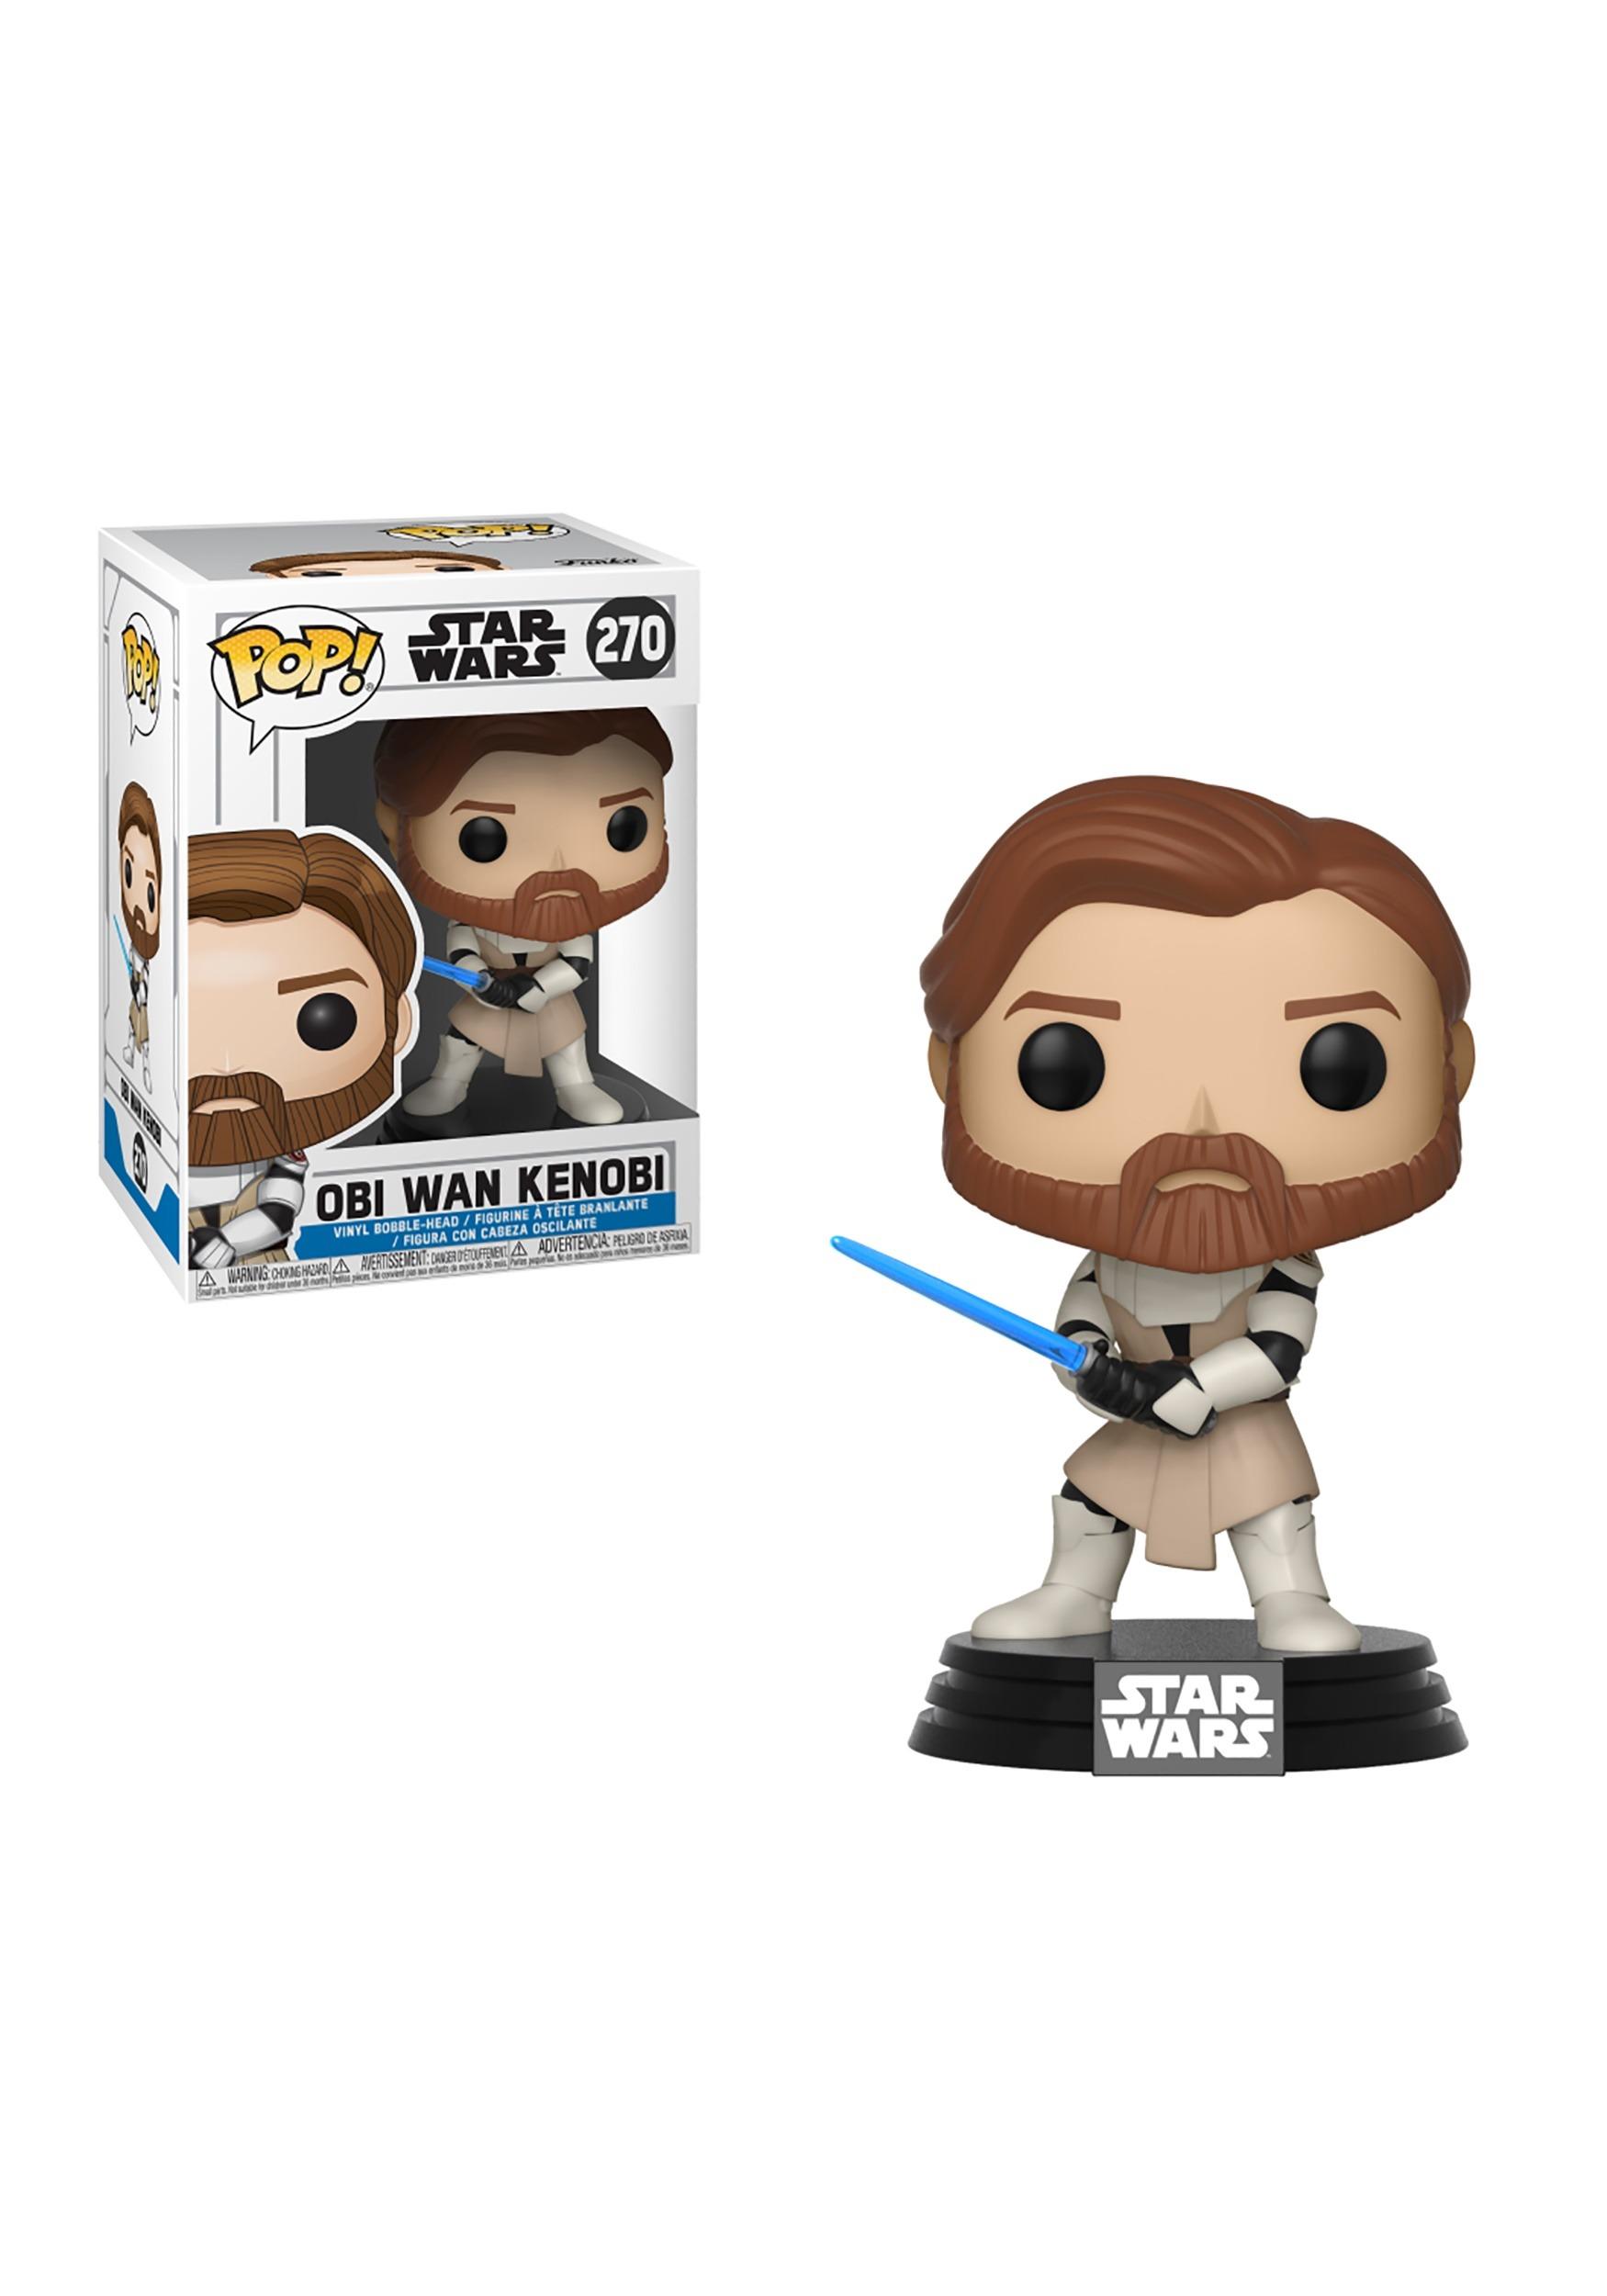 Pop Star Wars Clone Obi Wan Kenobi Bobblehead Figure Fiction Blouse With Off White